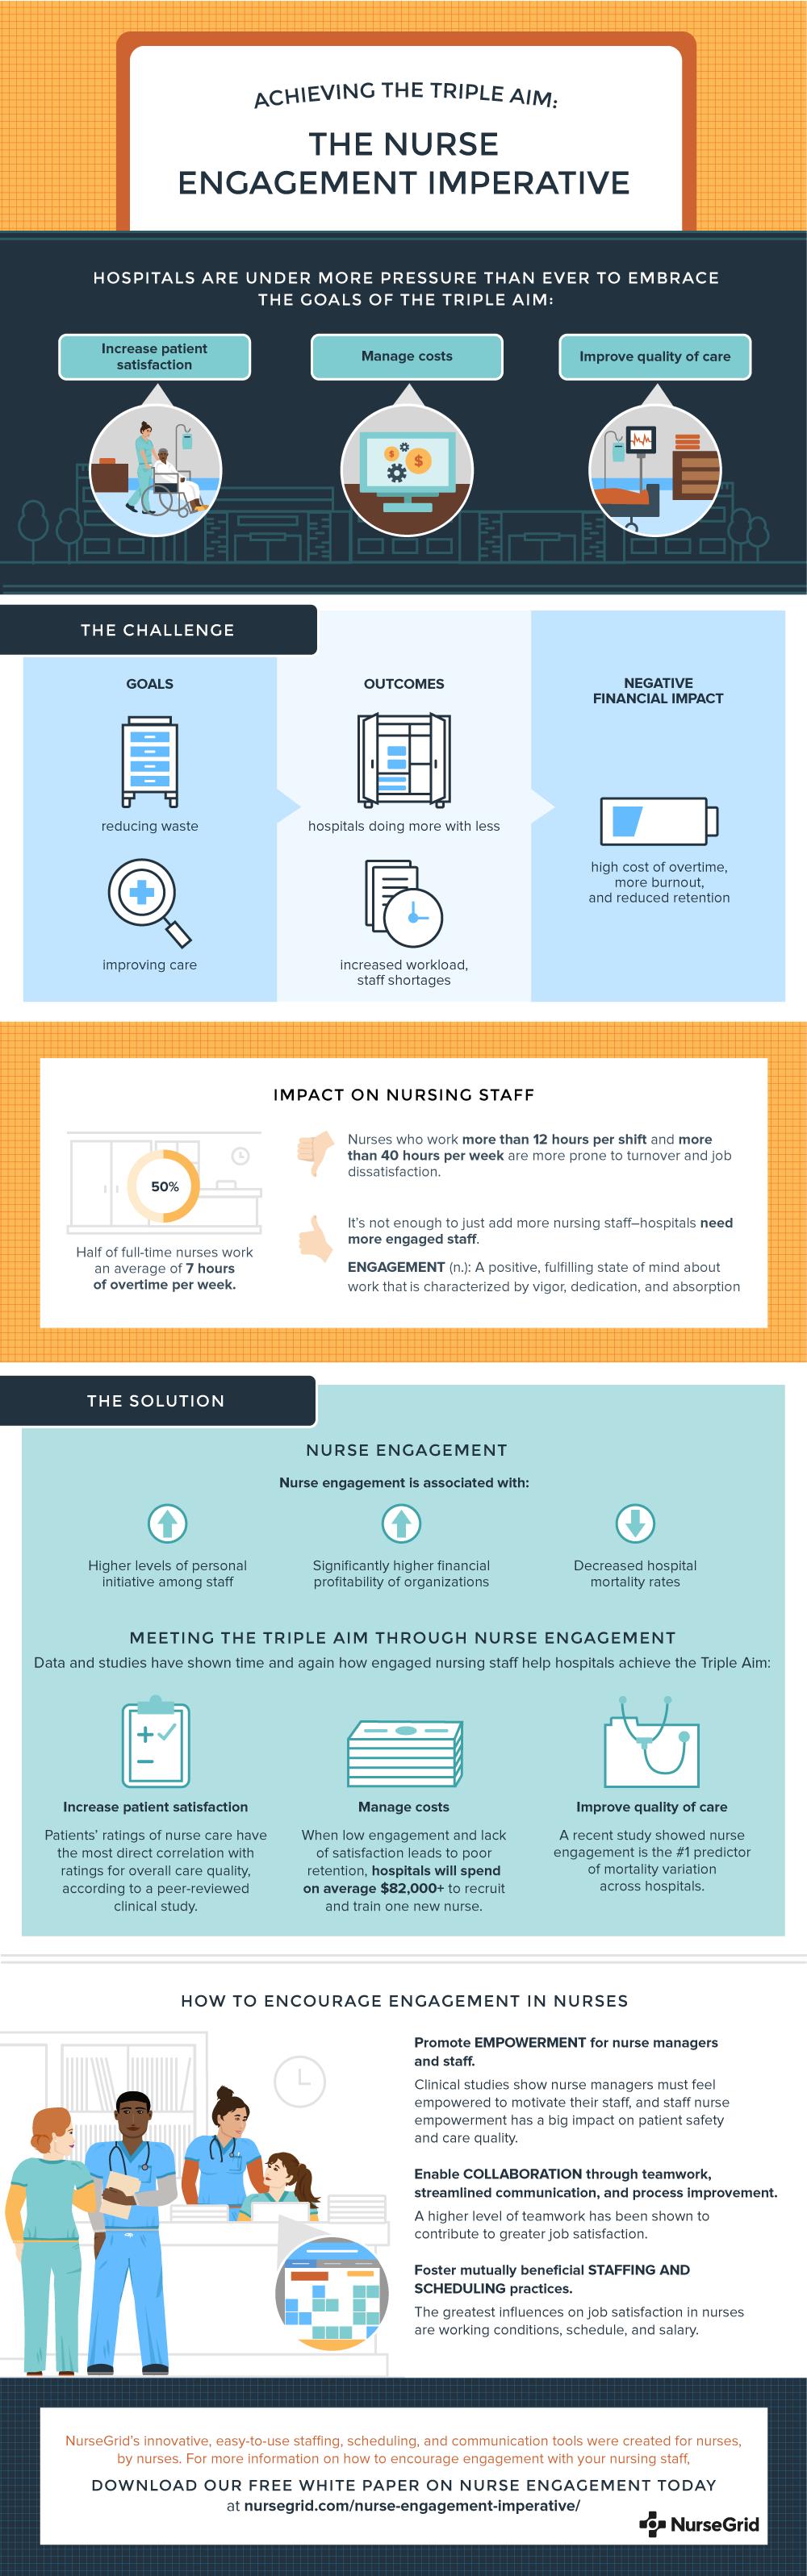 The Nurse Engagement Imperative